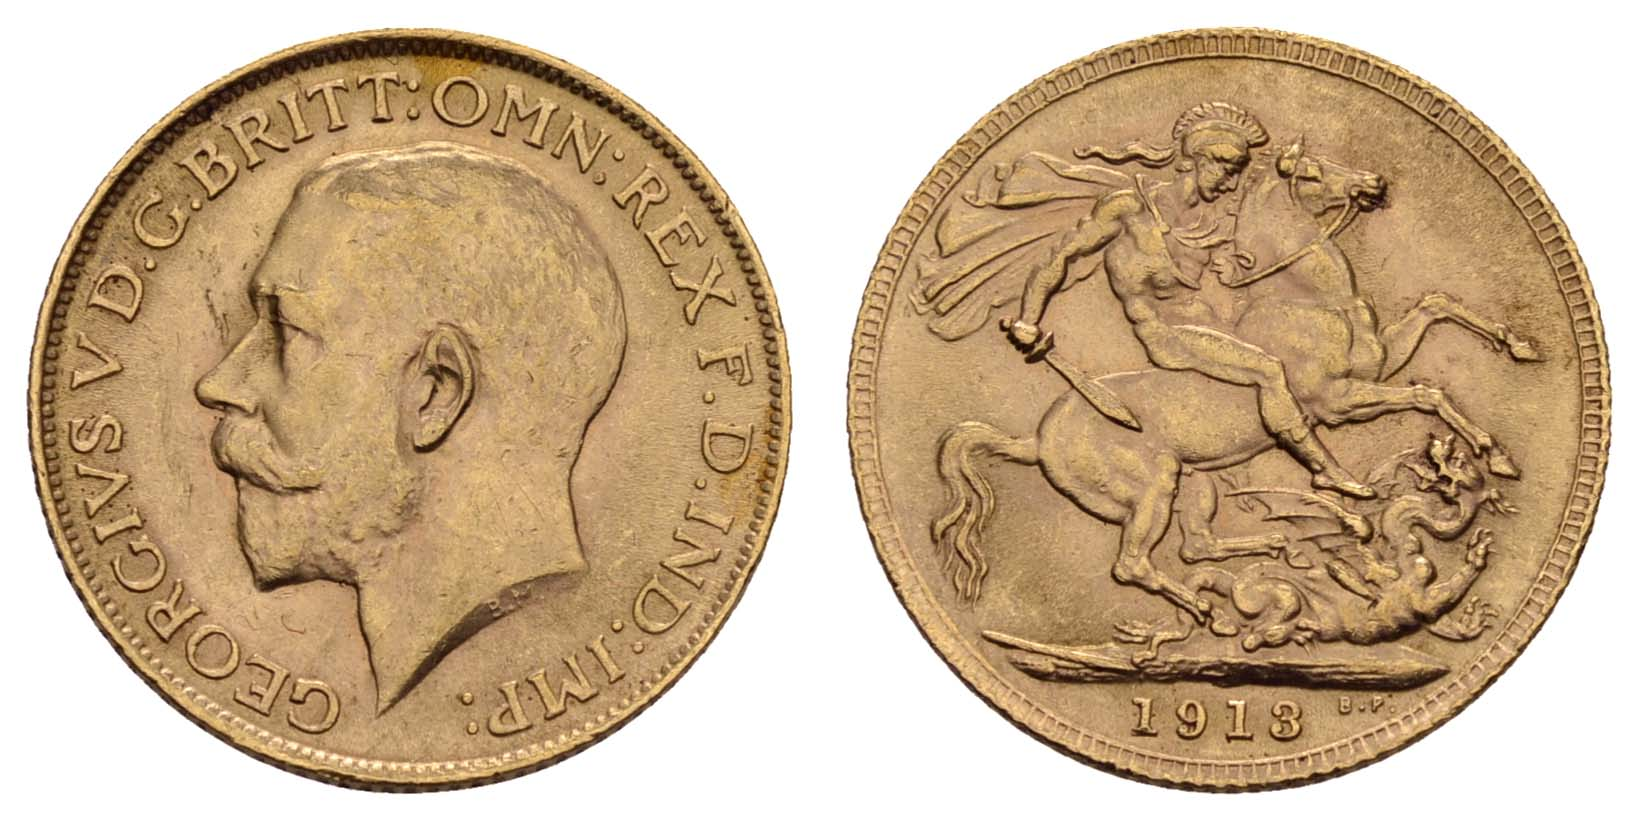 Lot 1601 - europa ab 1800 - Großbritannien -  Auktionshaus Ulrich Felzmann GmbH & Co. KG Coins single lots